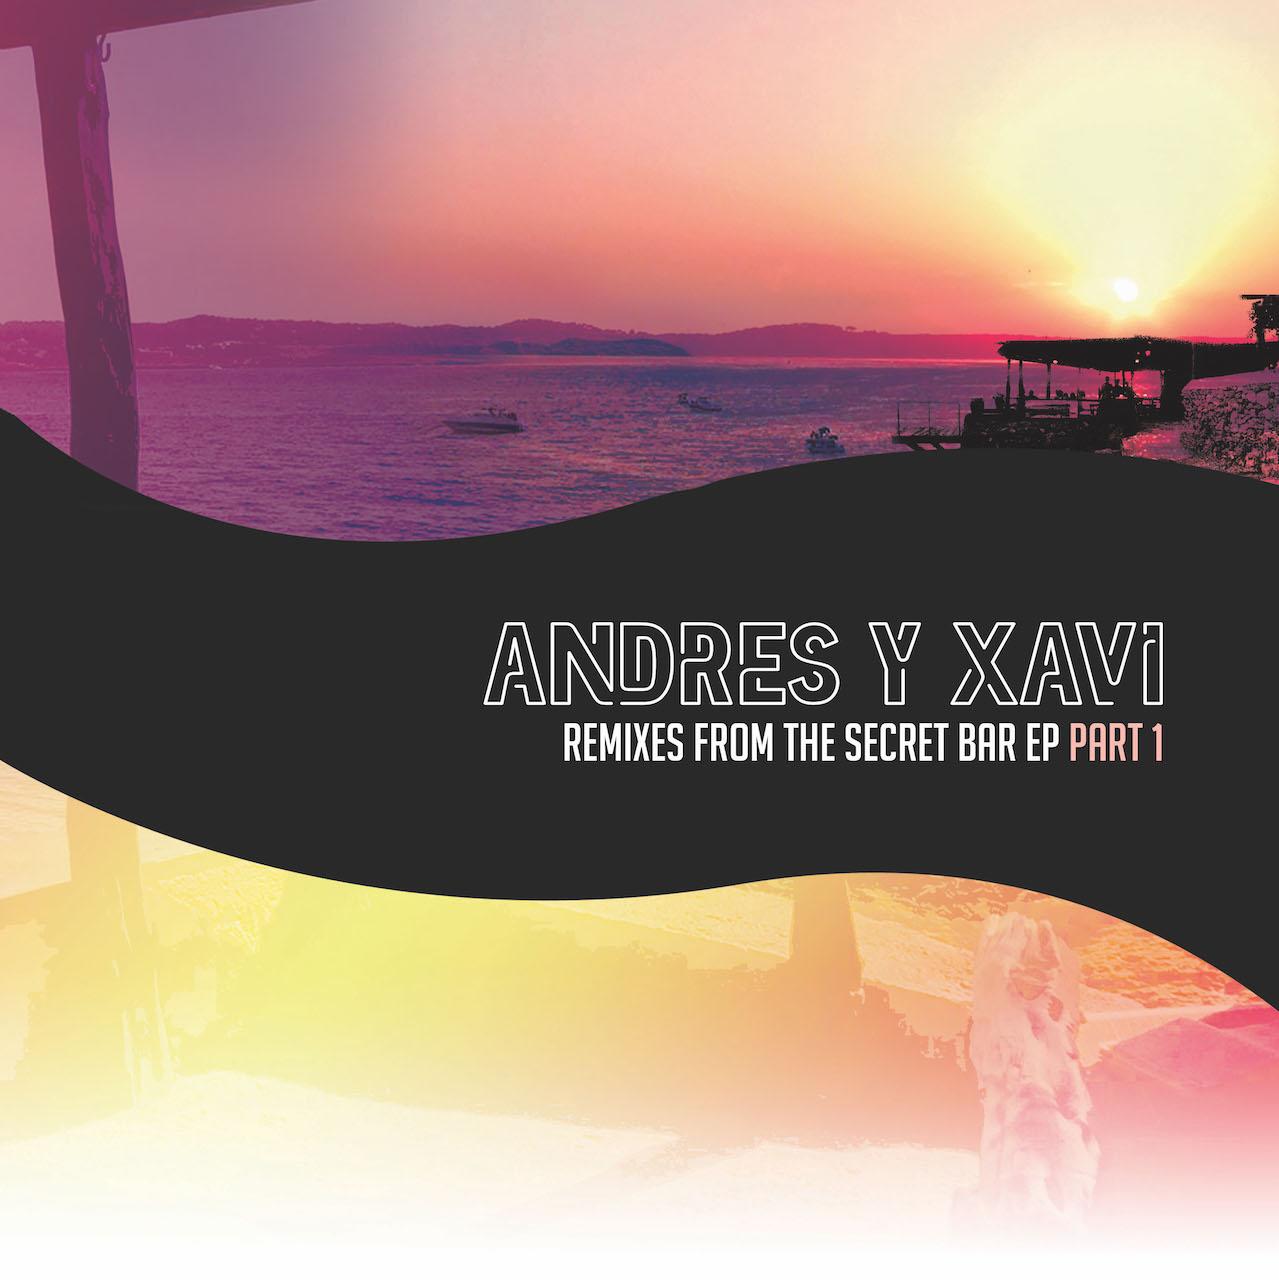 andres y xavi remixes cover